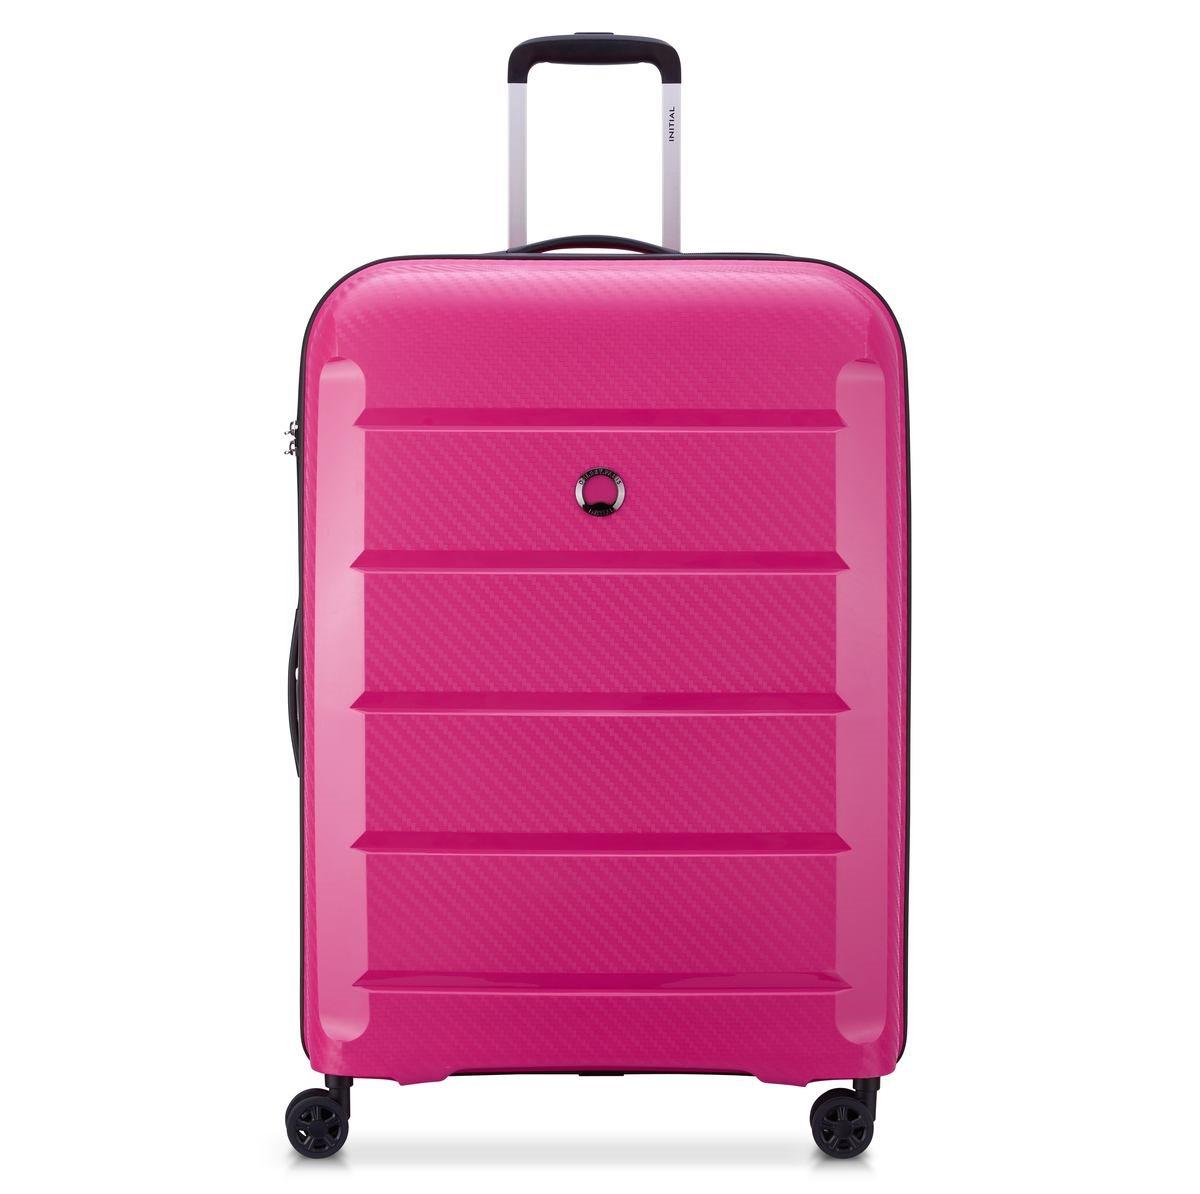 Delsey Βαλίτσα μεγάλη 75x53x30cm σειρά Binalog Pink